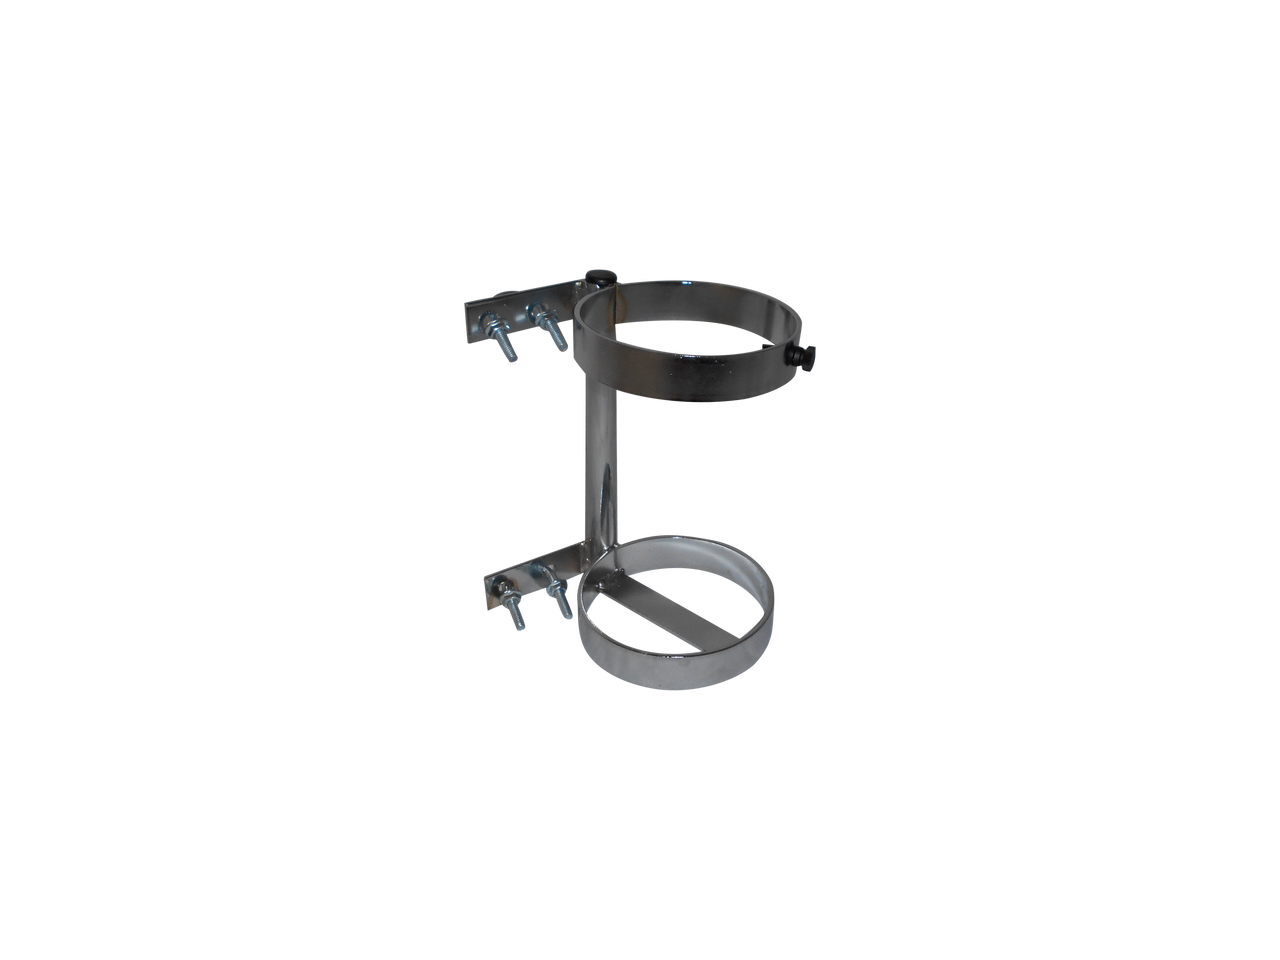 Universal Walker Mountable Oxygen Cylinder Rack for One D or E (4 38